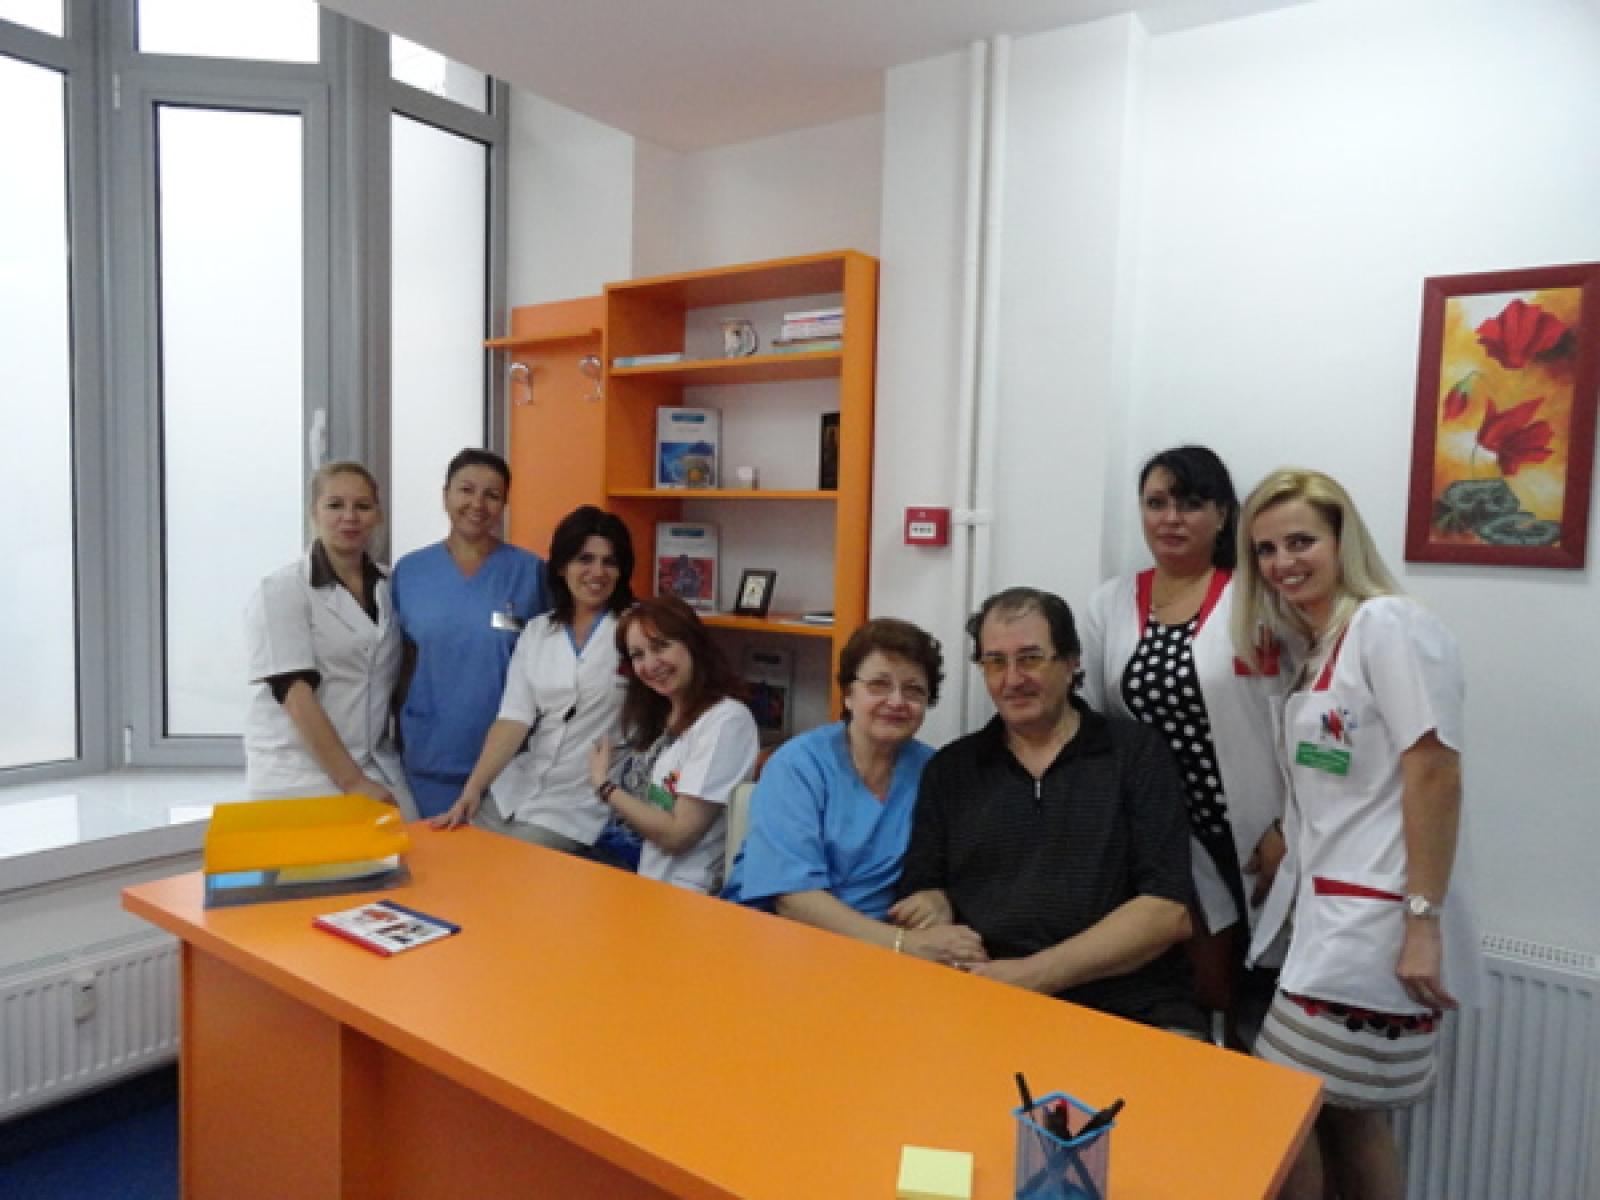 Centrul Medical Panaceea - panaceea.jpg